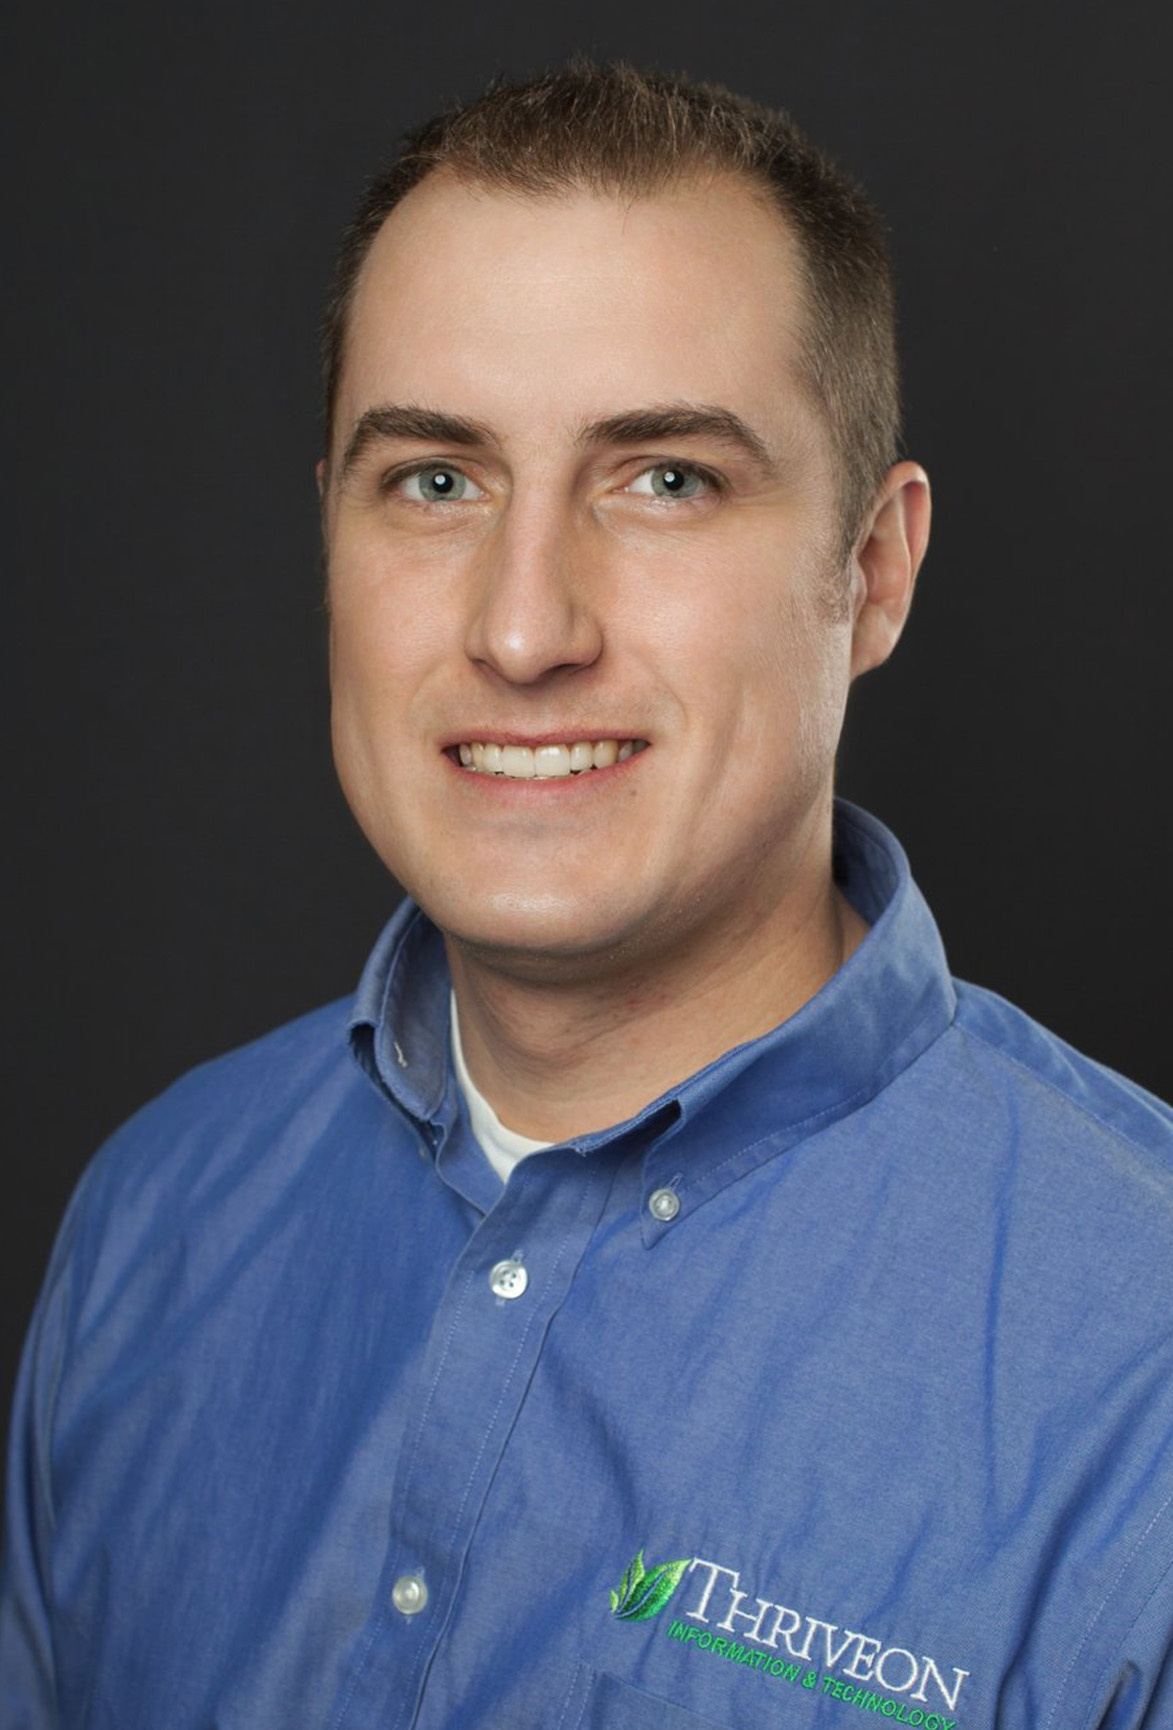 Sam Bloedow, CEO & Founder of Thriveon